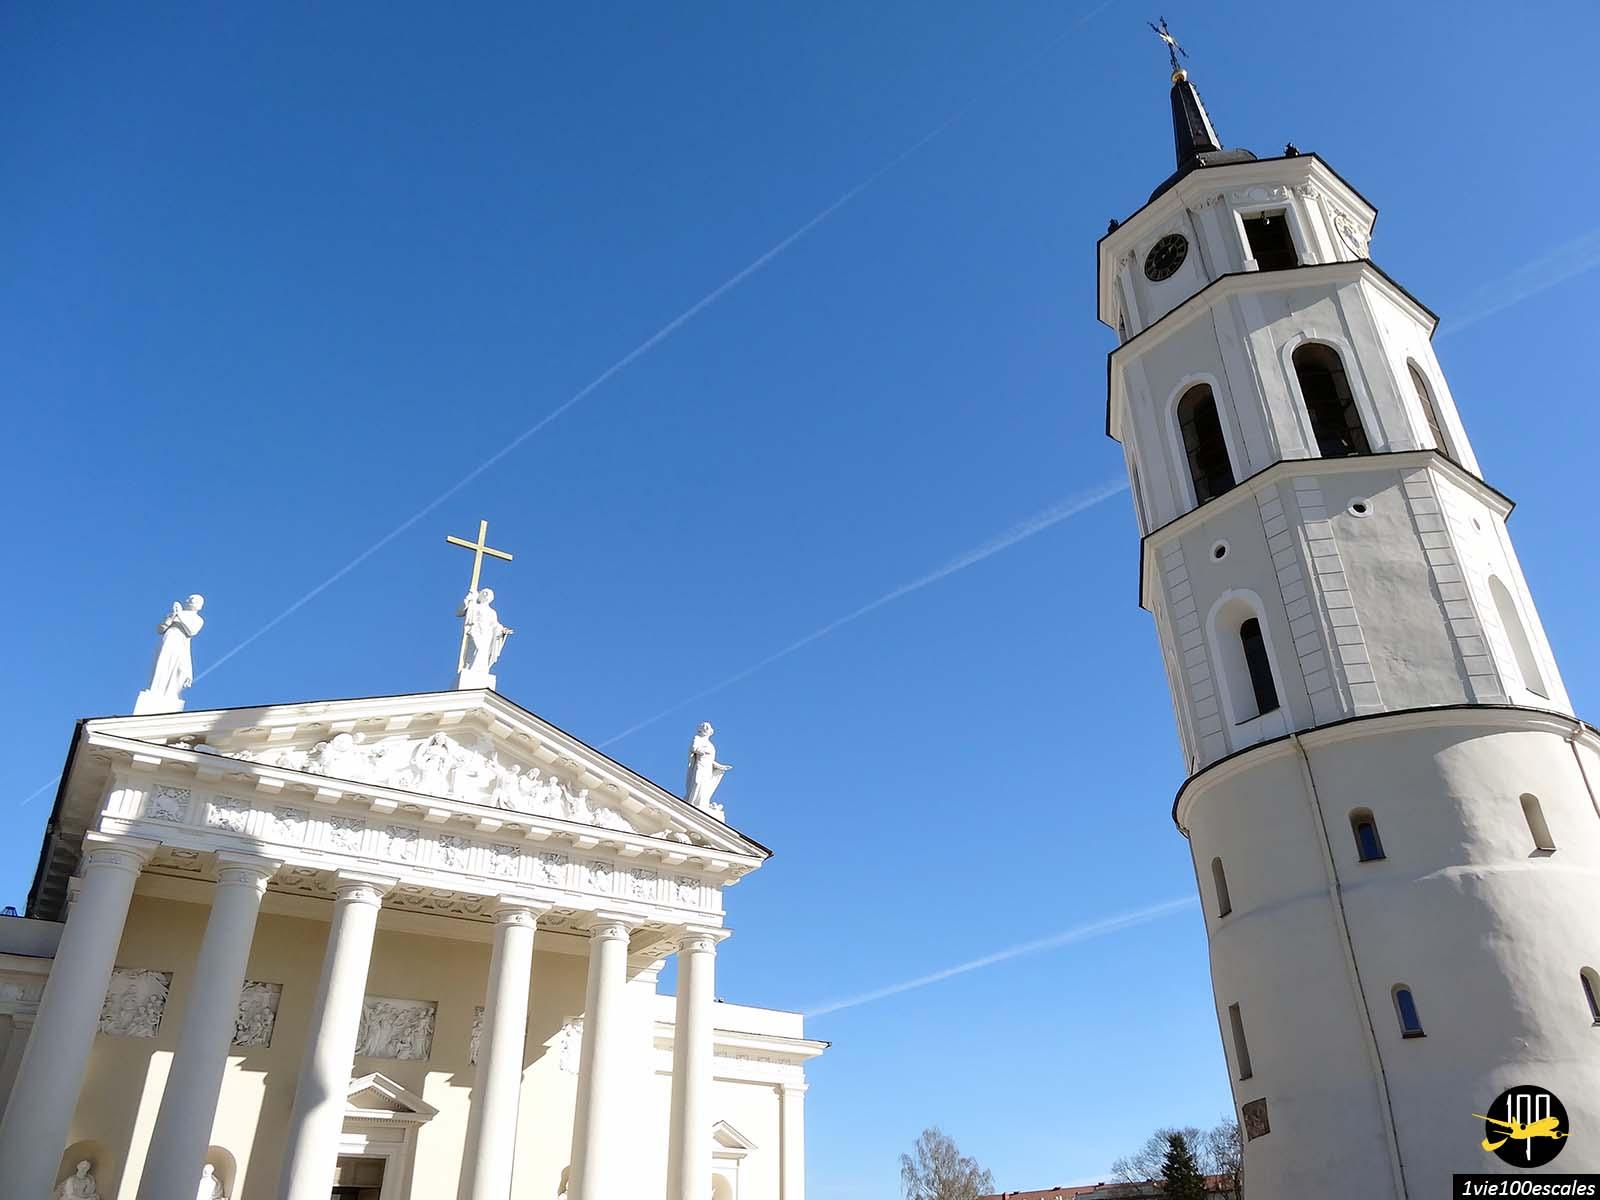 Escale #066 Vilnius